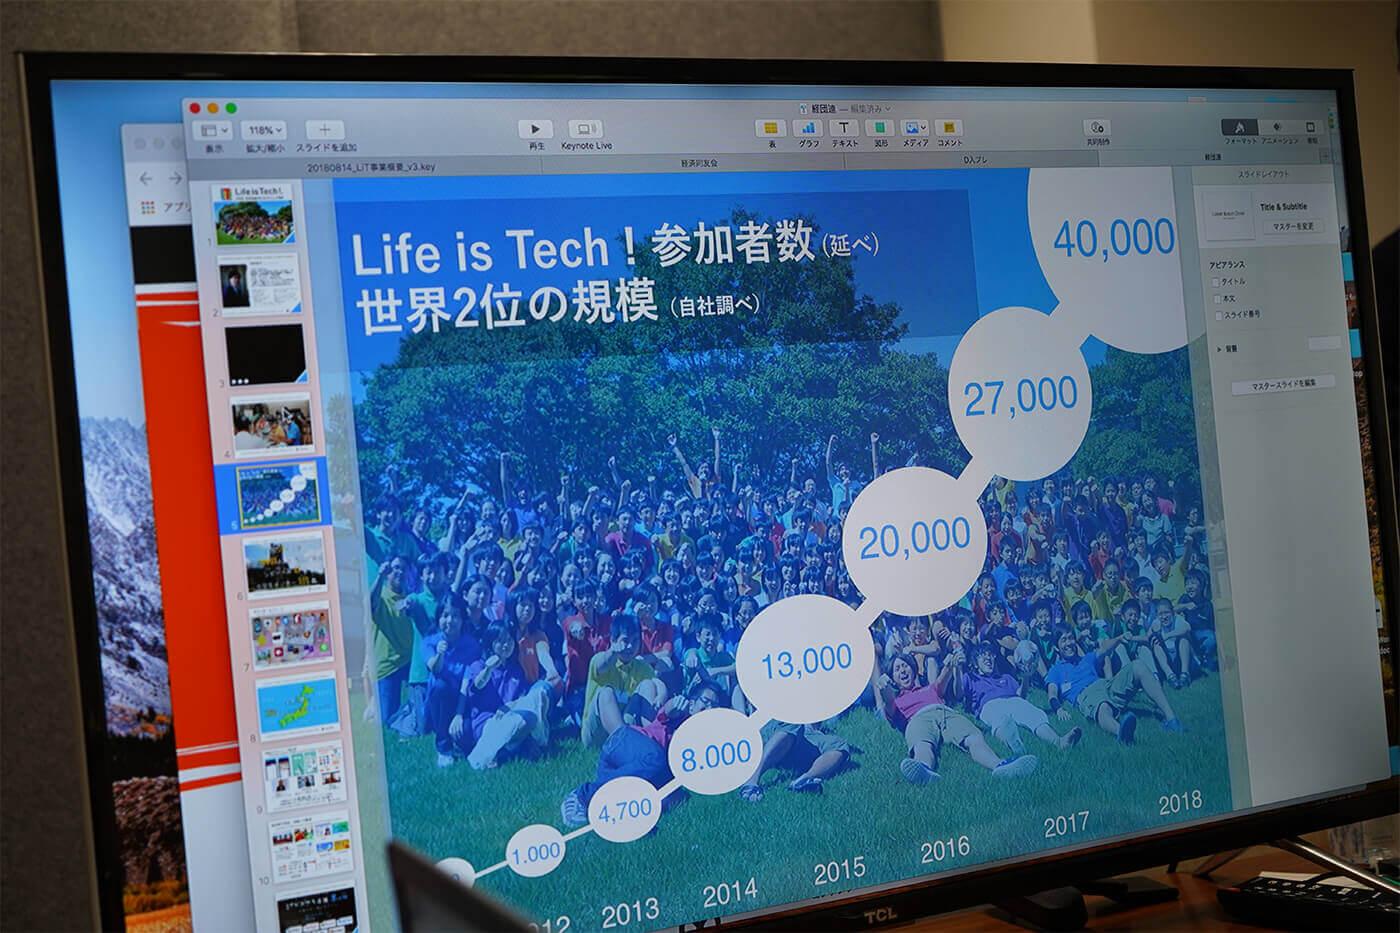 Life is Tech!参加者数 世界2位の規模